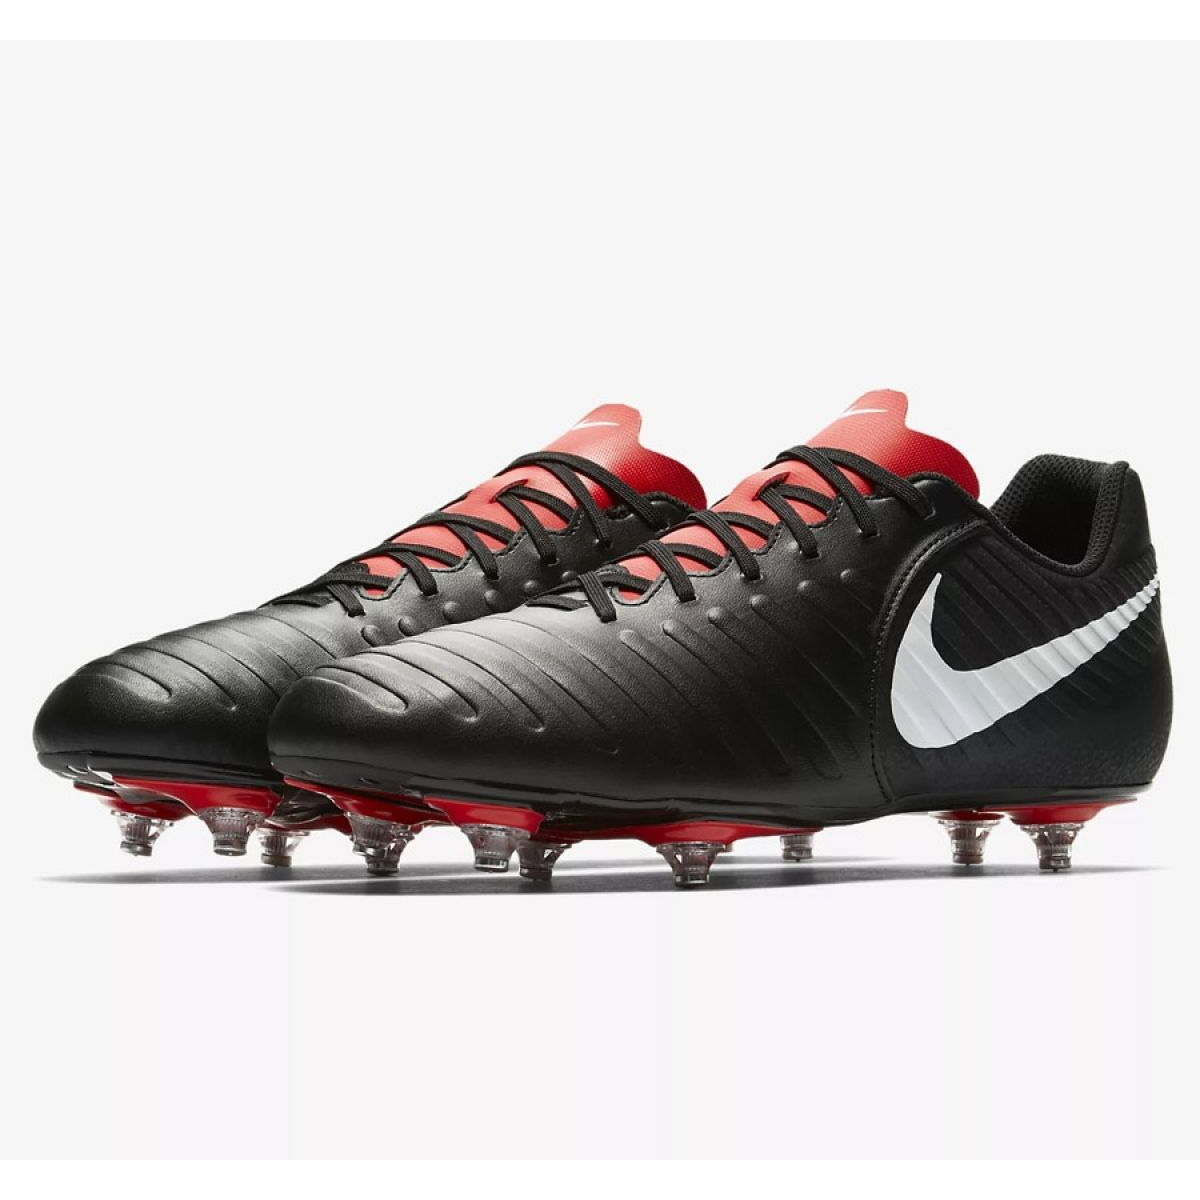 best cheap 15eac 36803 Football shoes Nike Tiempo Legend 7 Club Sg M AH8800-006